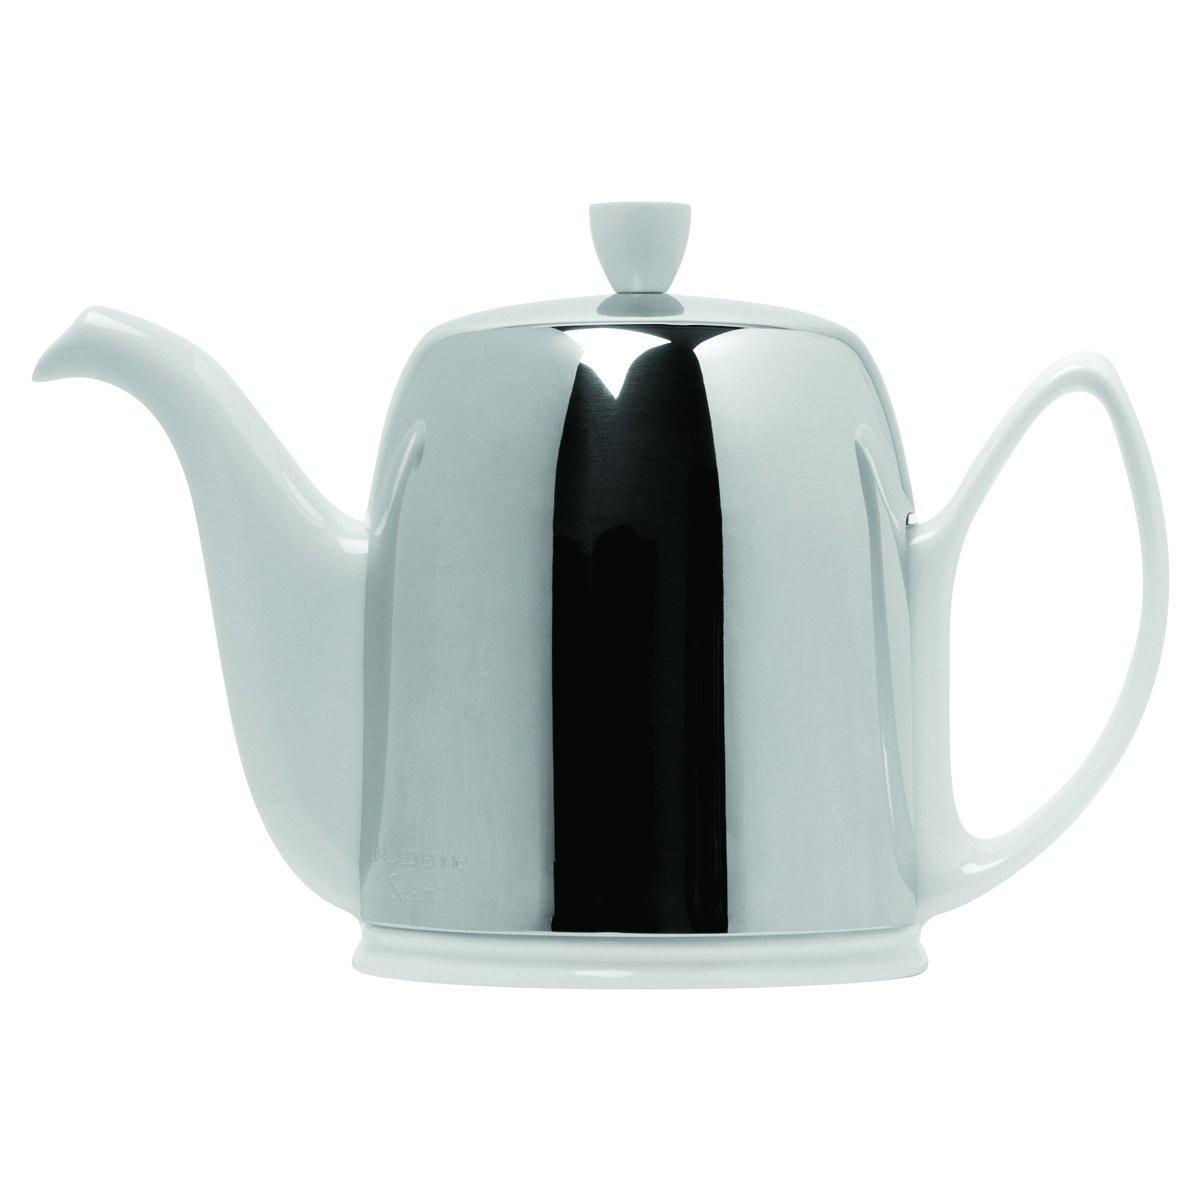 DEGRENNE -  SALAM WHITE Tea Pot 8 Cups, 43 oz 15/16